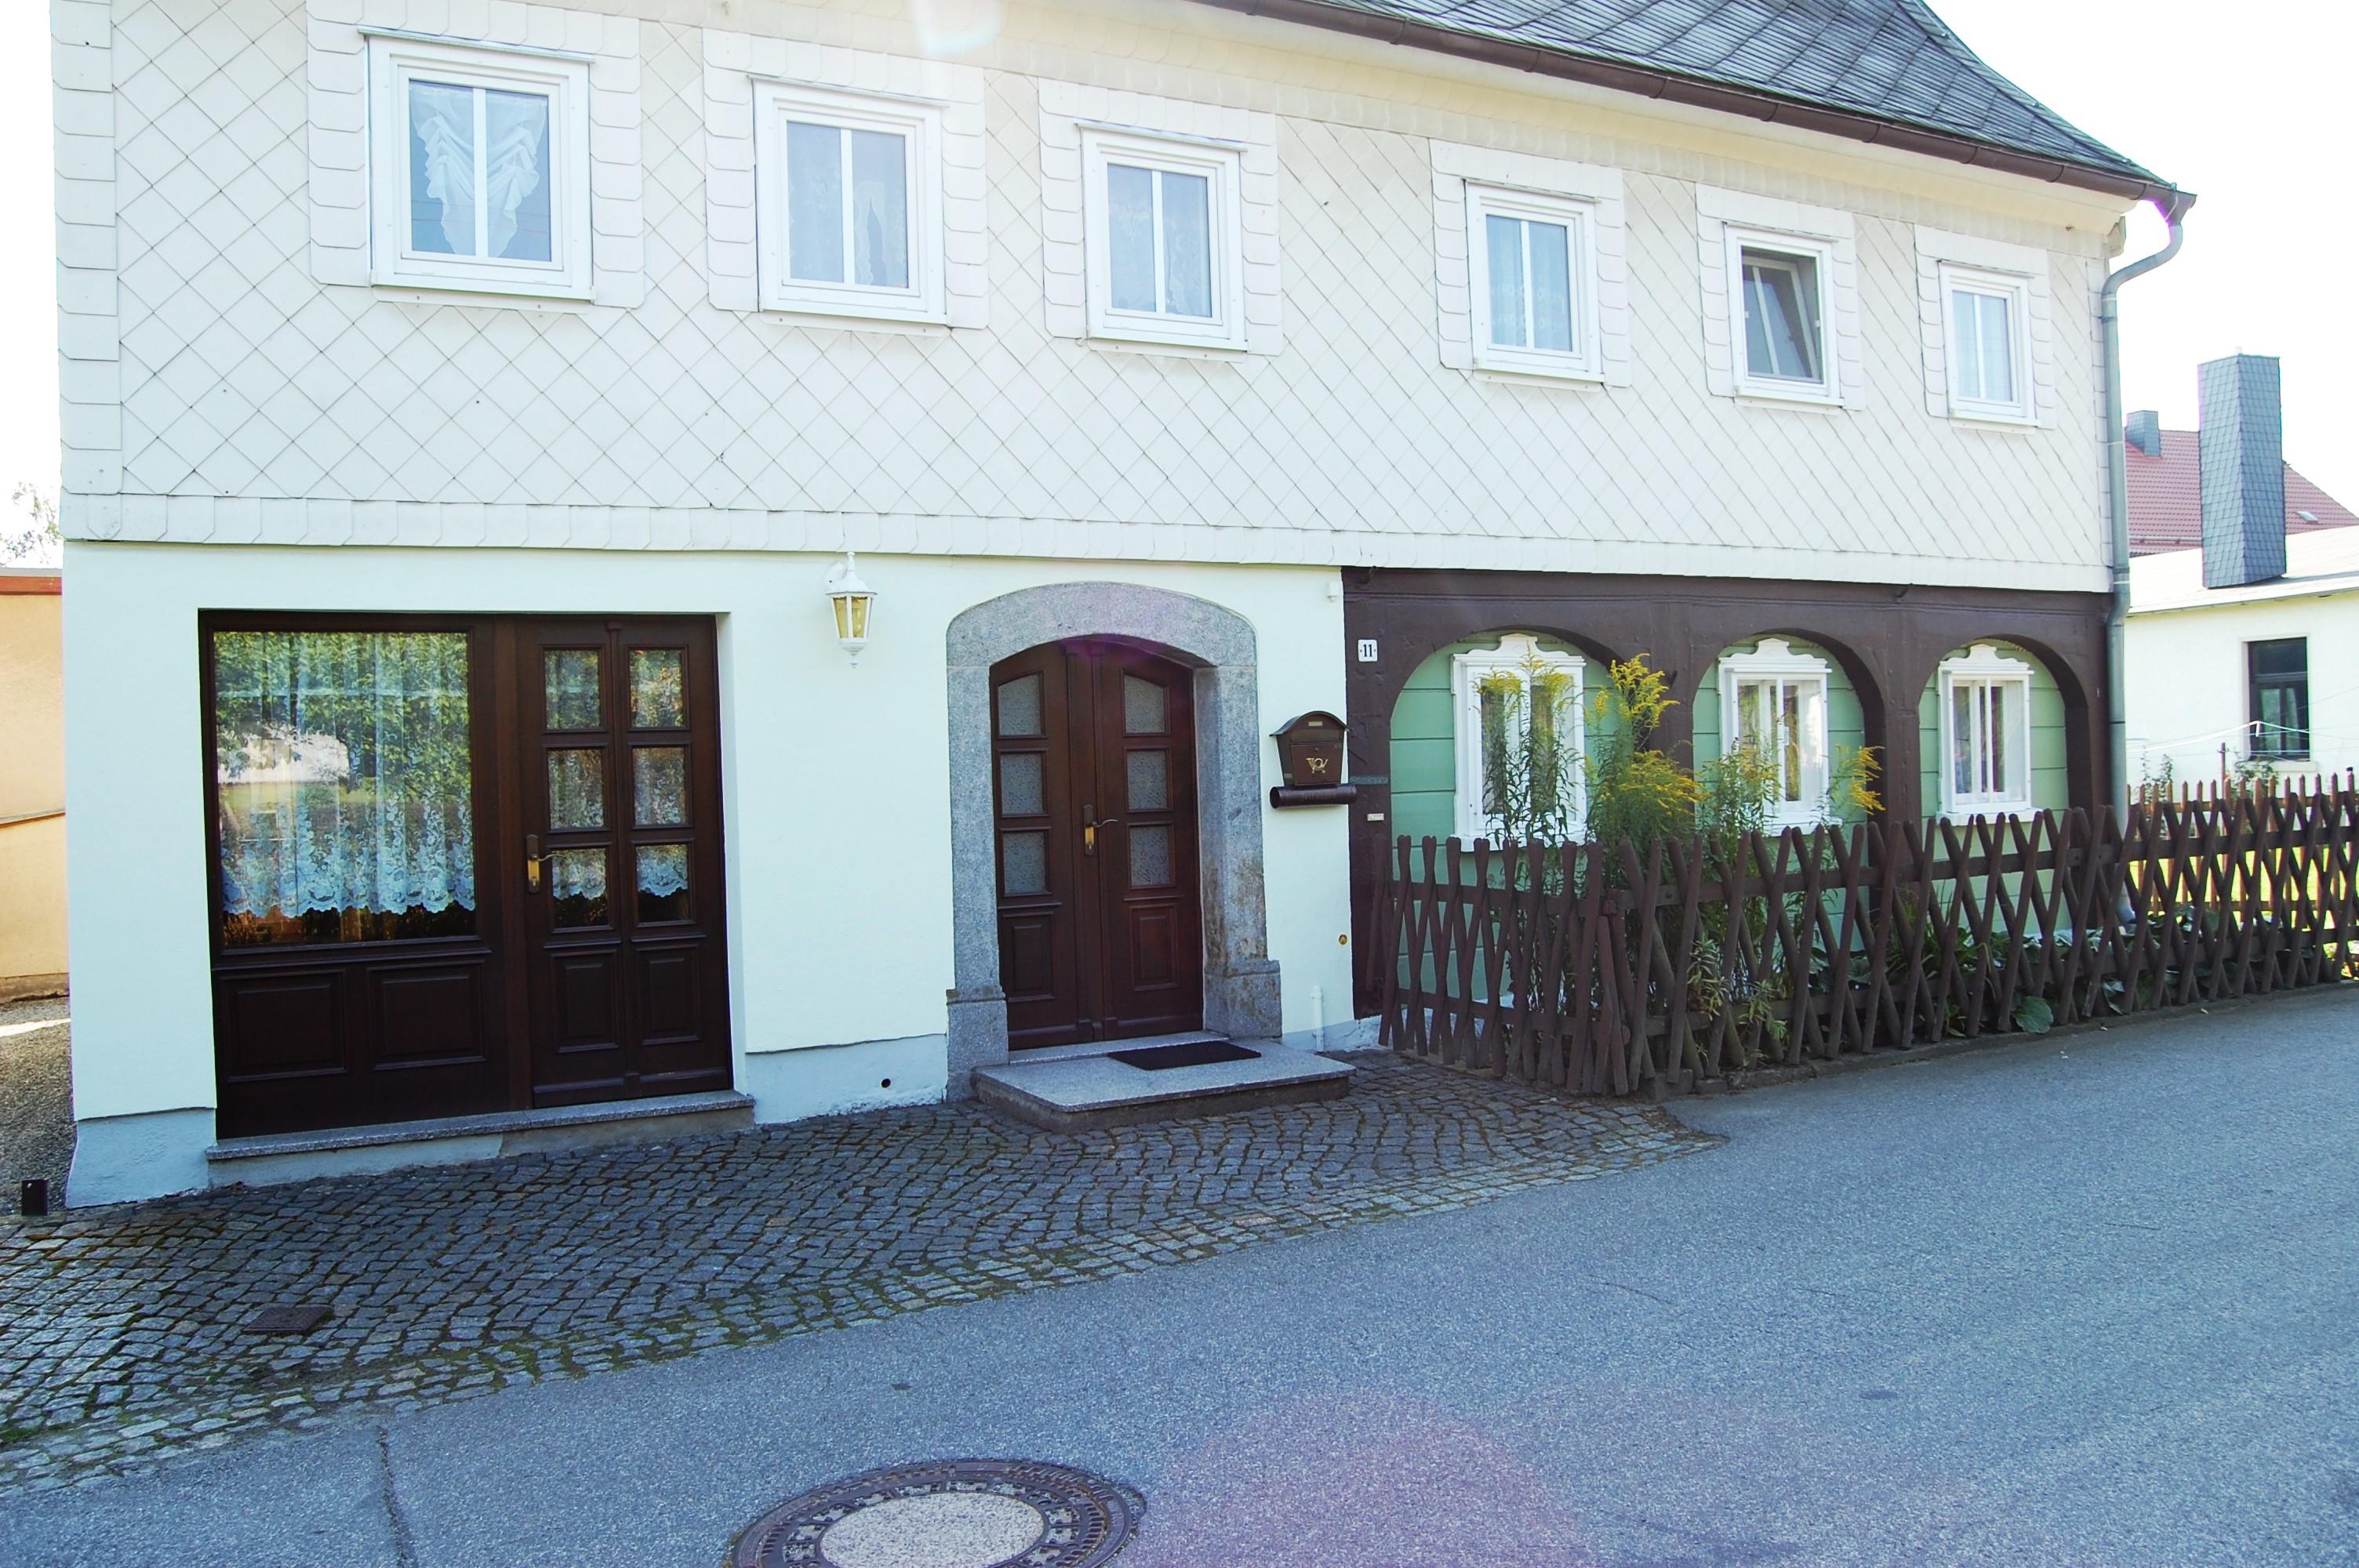 datei umgebinde k the kollwitz stra e 11 walddorf 1 jpg wikipedia. Black Bedroom Furniture Sets. Home Design Ideas